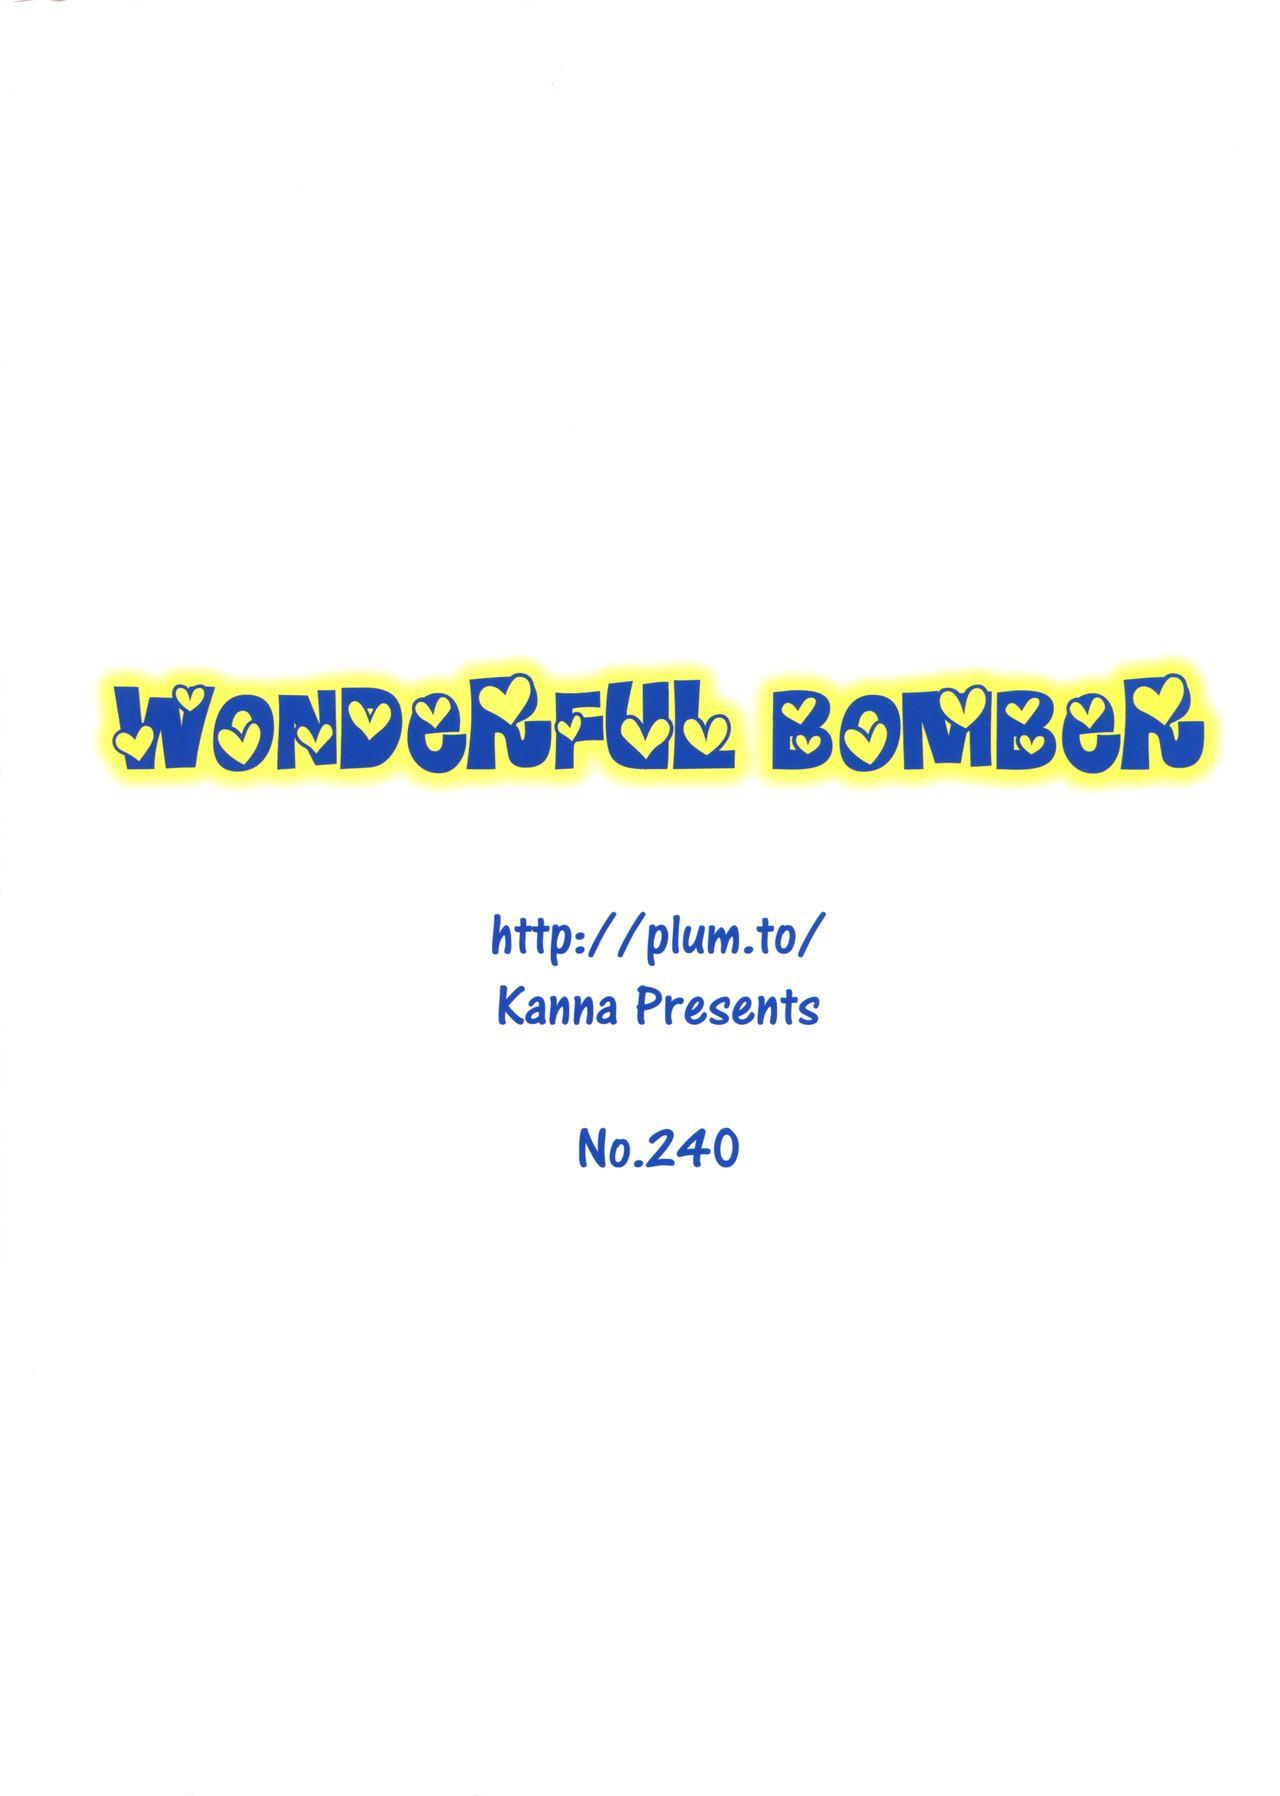 Wonderful Bomber 1